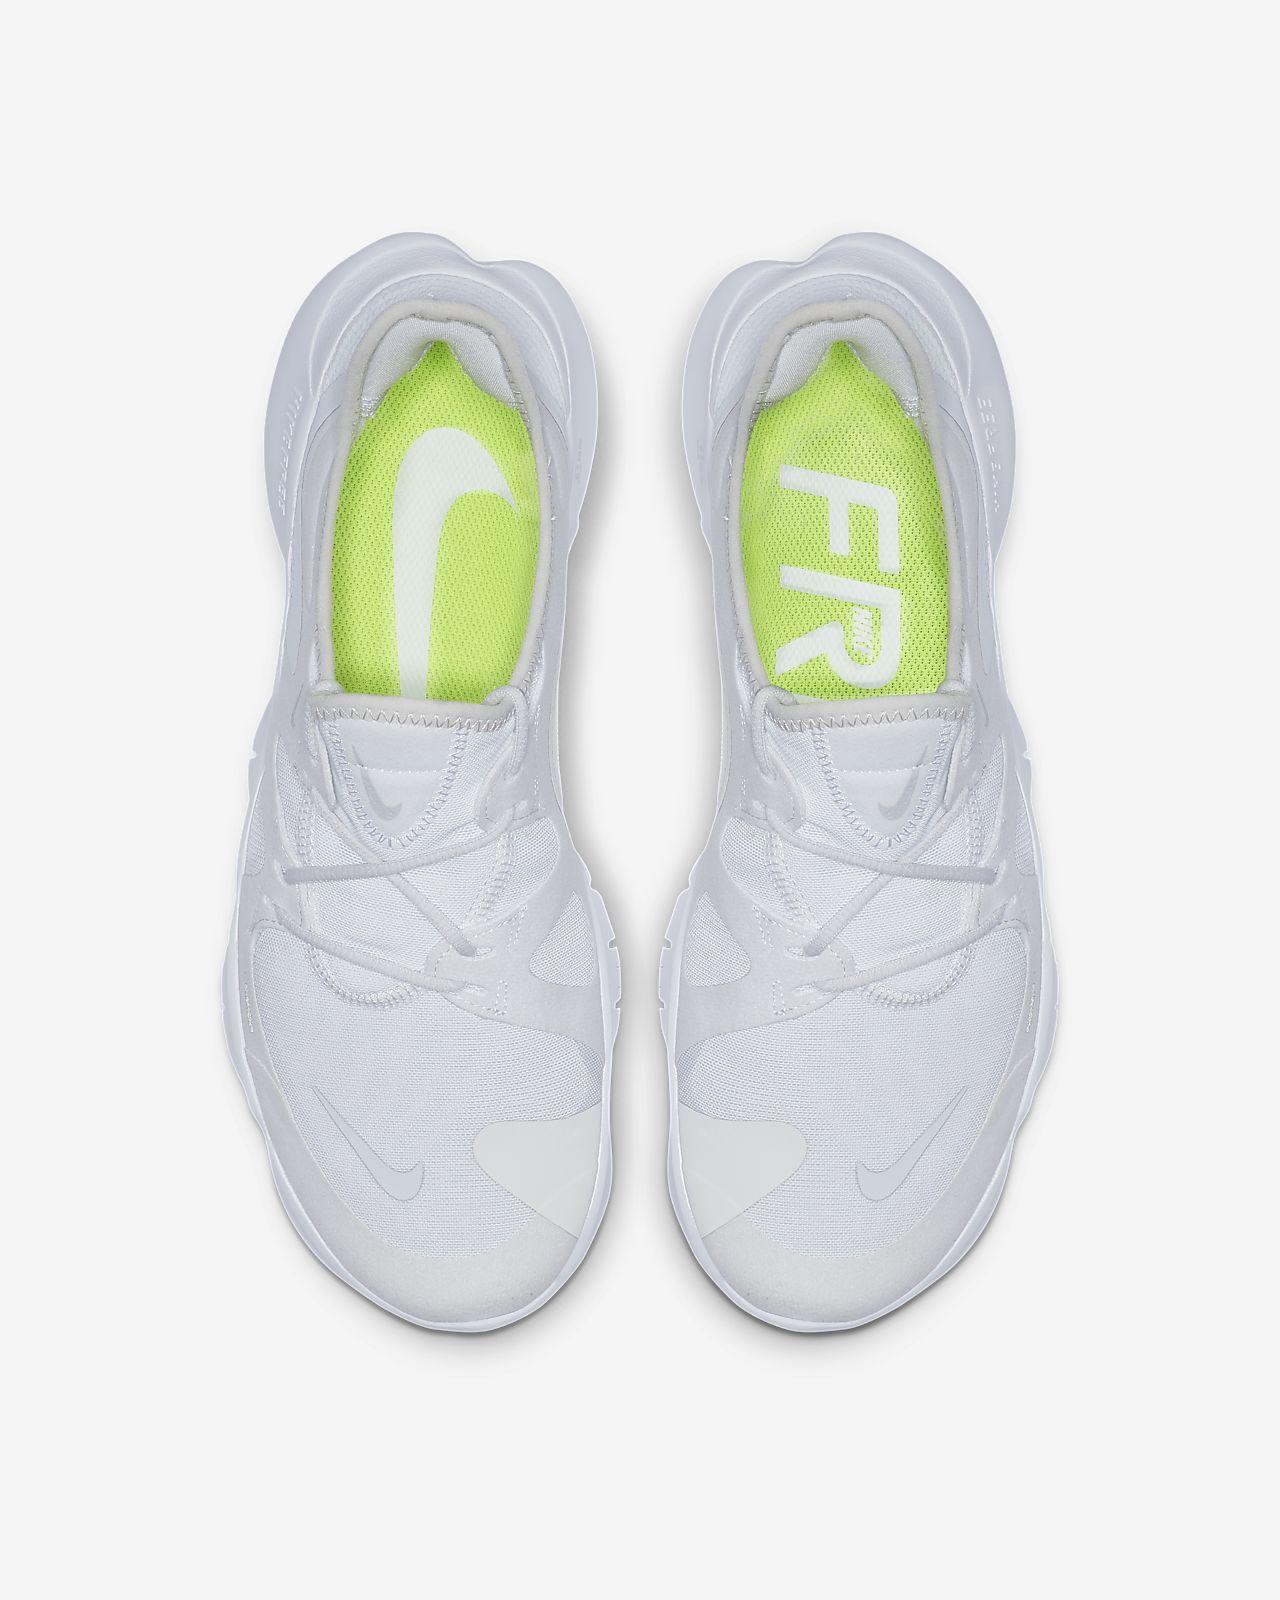 11.5, Platinum Tint//Pure Platinum//White//Volt Nike Free RN 5.0-Mens